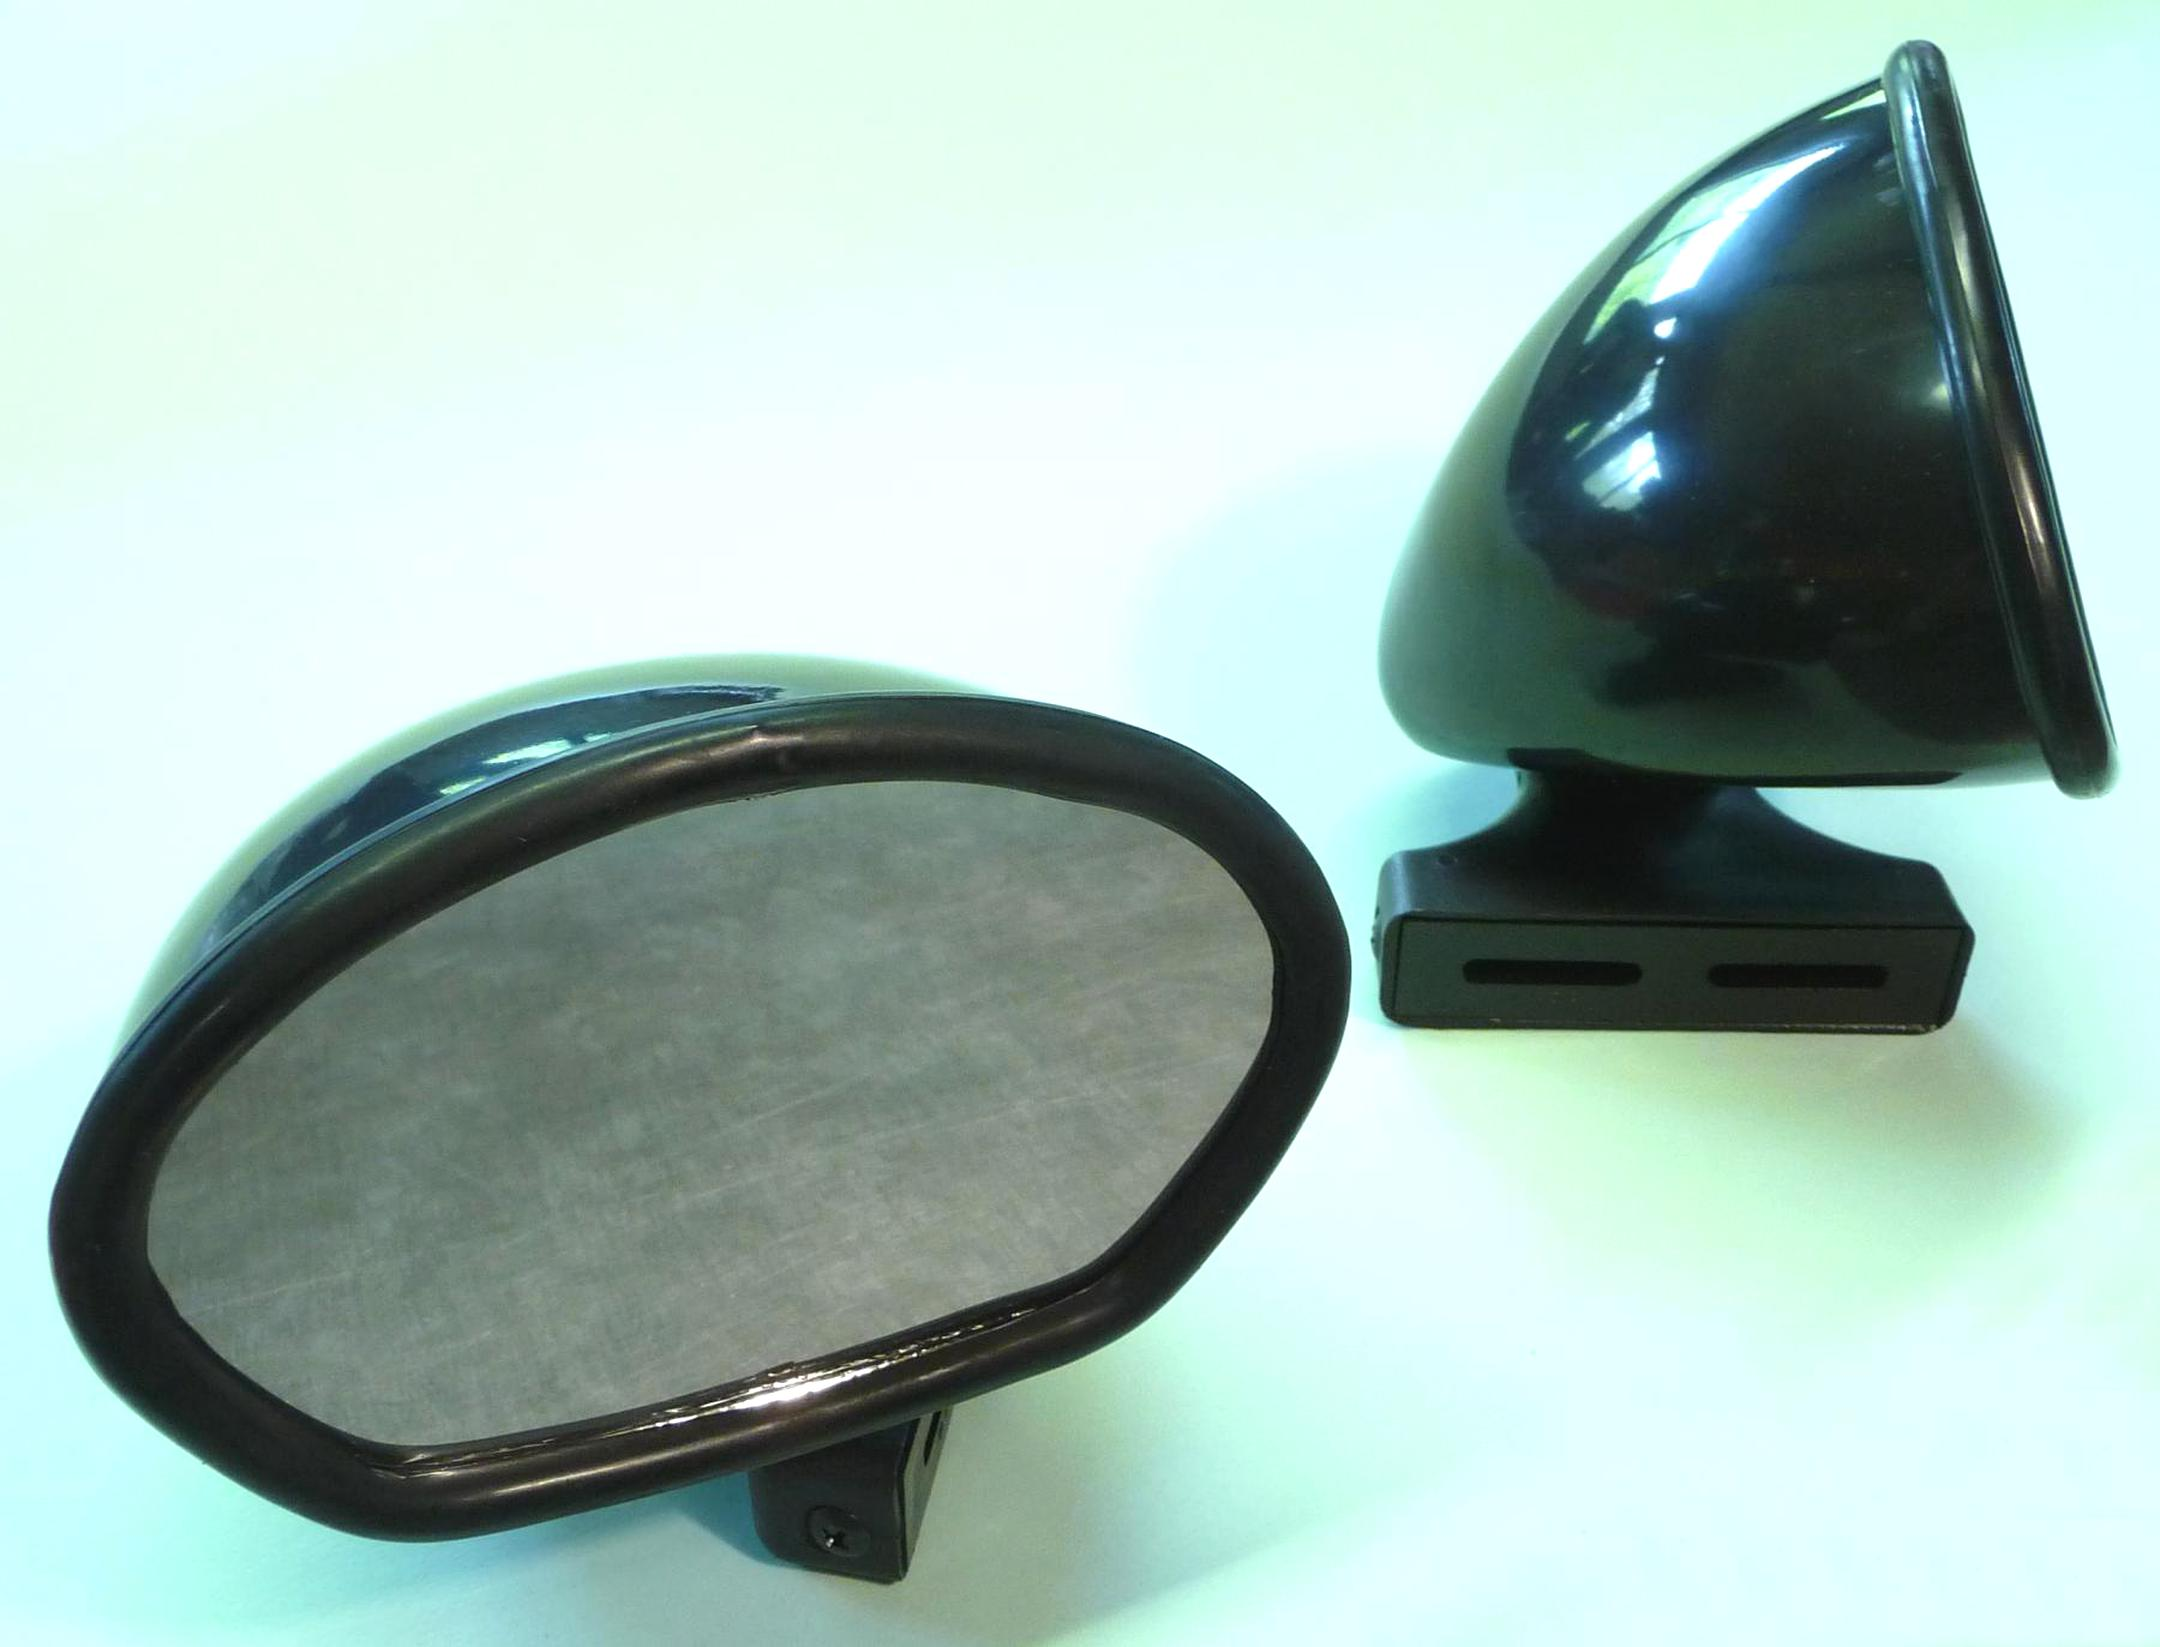 Ergotec Rückspiegel M-88 Spiegel universal oval schwarz